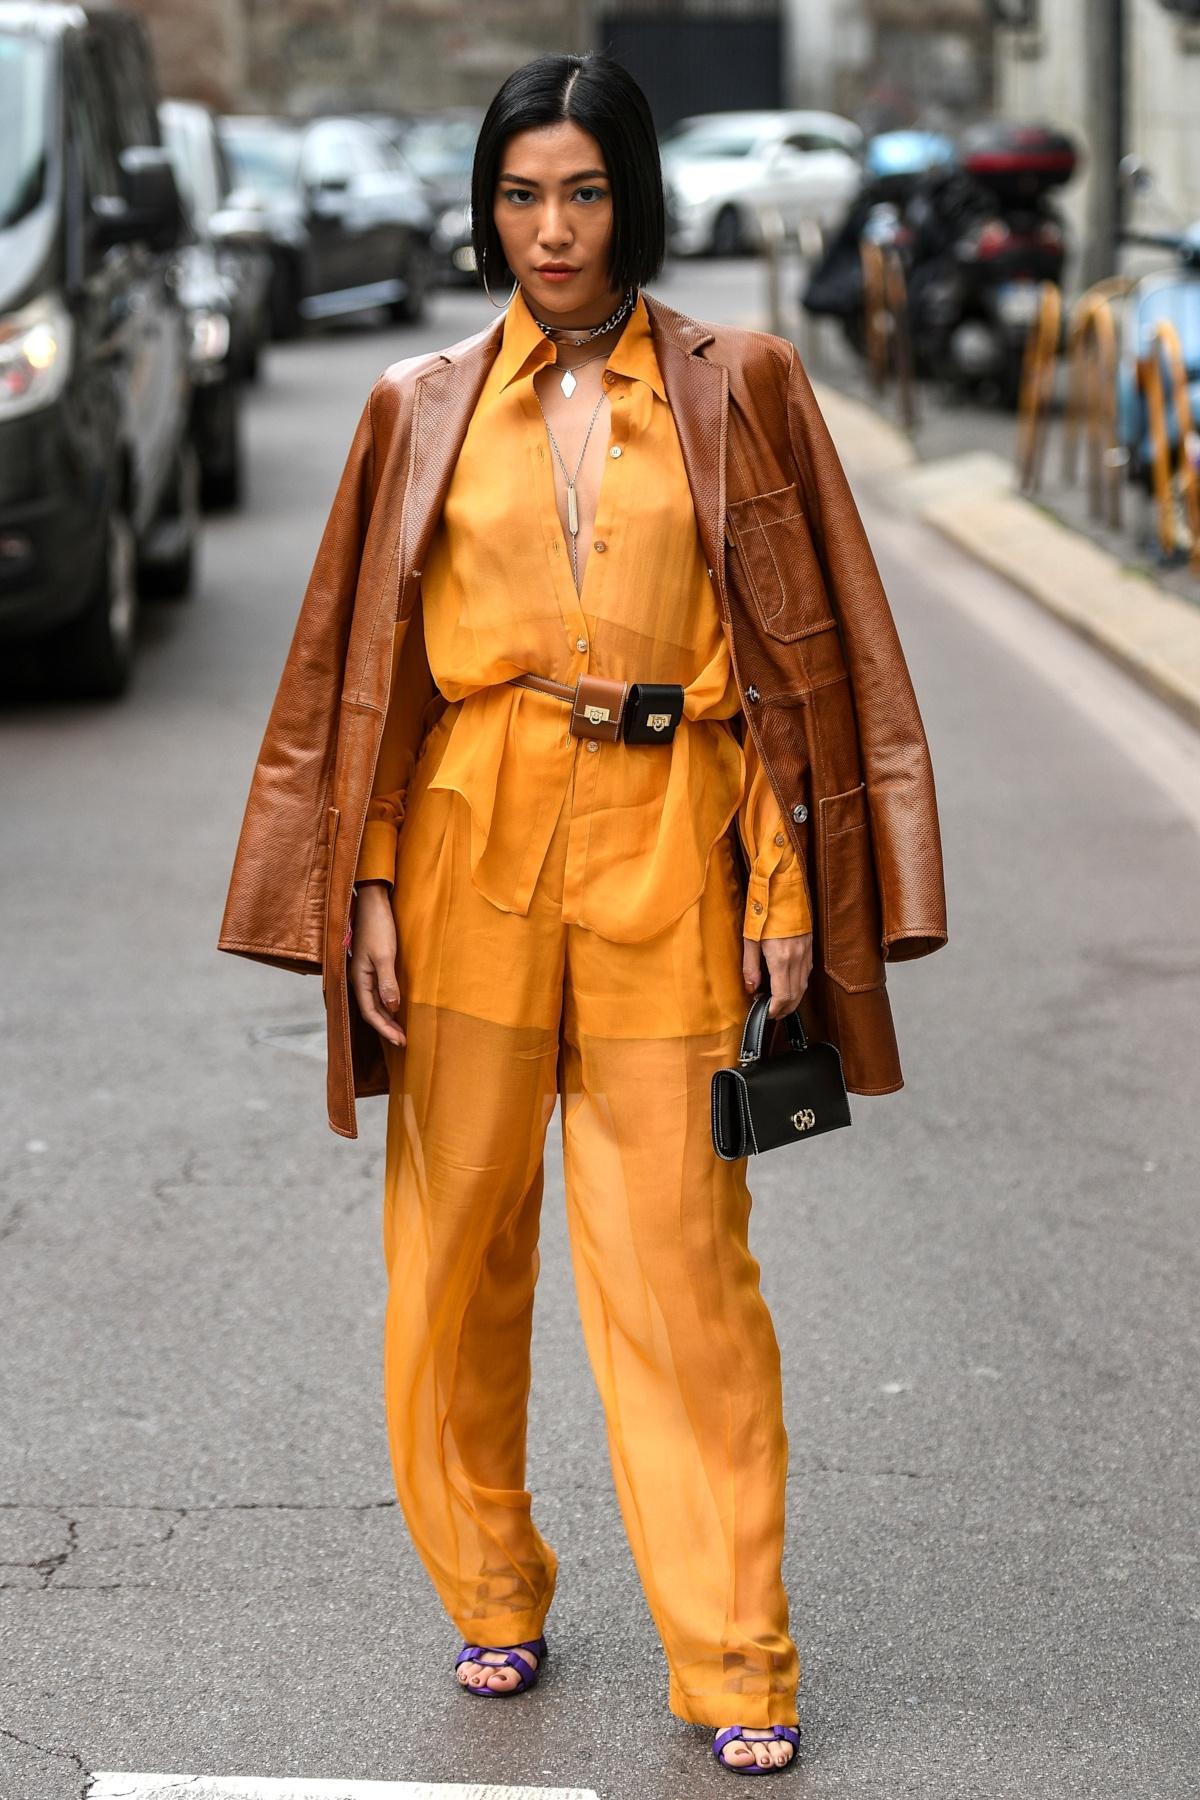 Anatomie d'un look : orange & marron